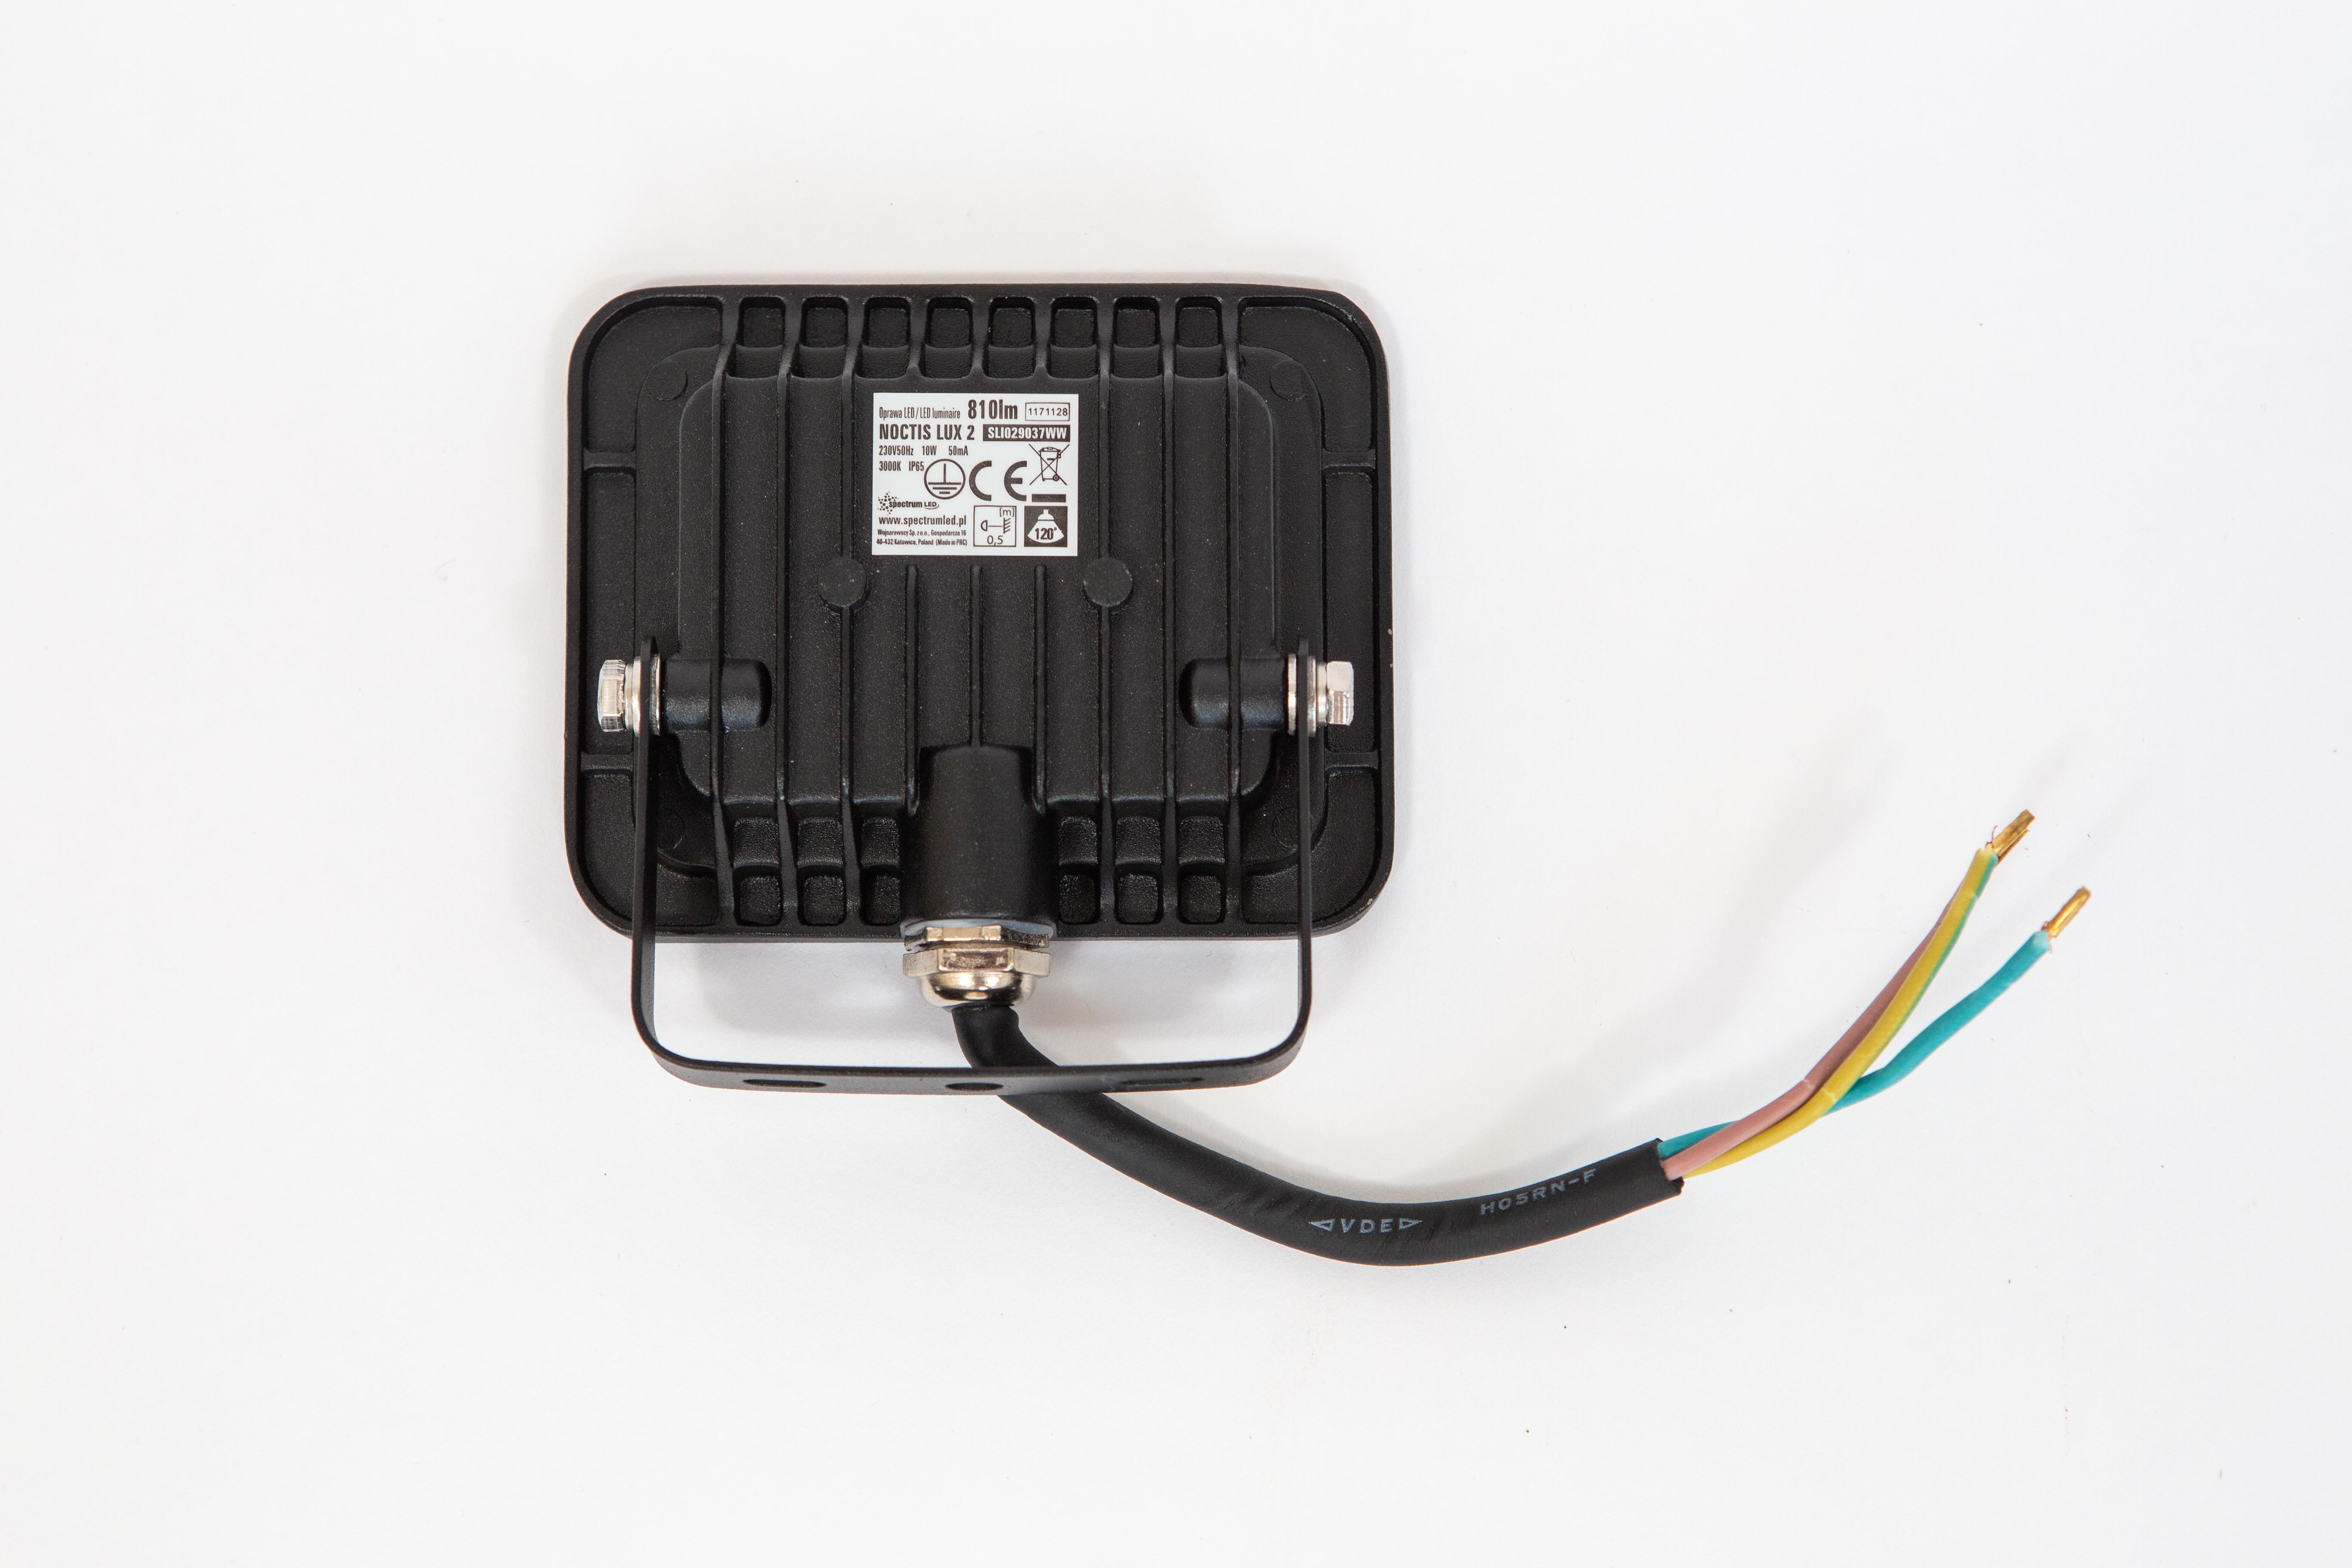 Proiector led 10 w, 810 lm, lumina calda ( 3000 k ), ip 65 , clasa a++,carcasa aluminiu negru [2]